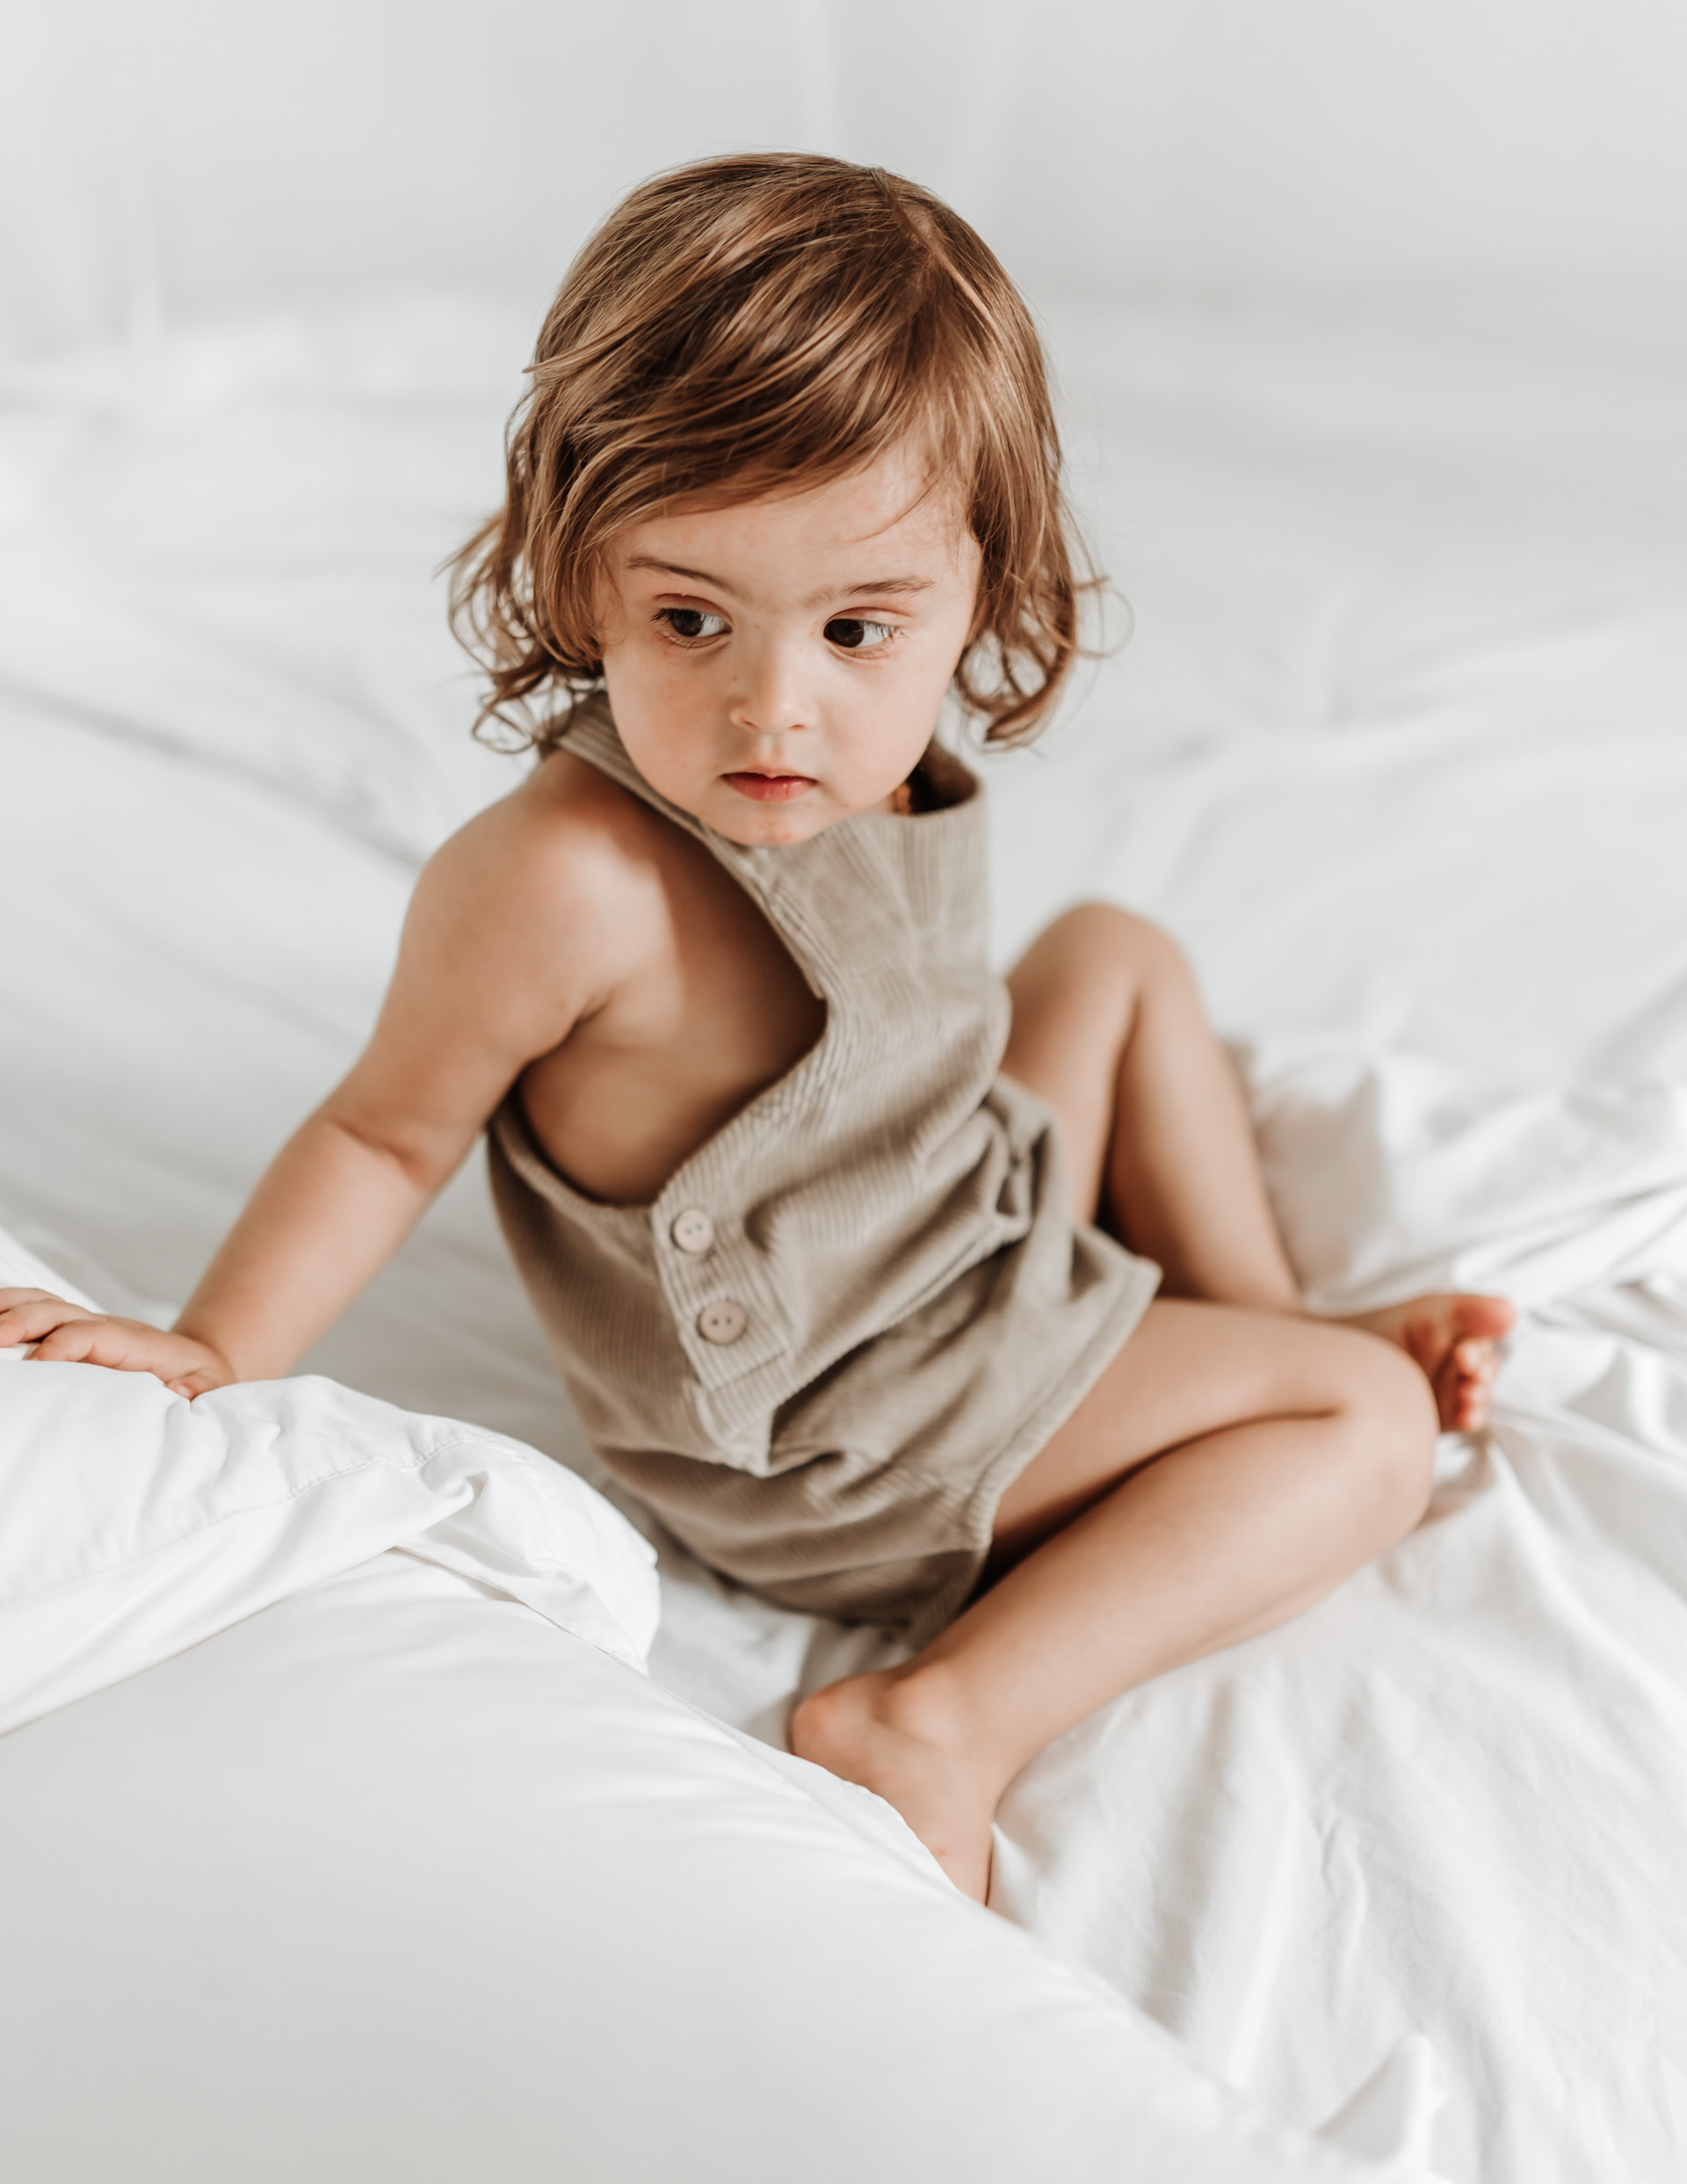 keira-mason-illoura-the-label-little-girl-in-bed.jpg